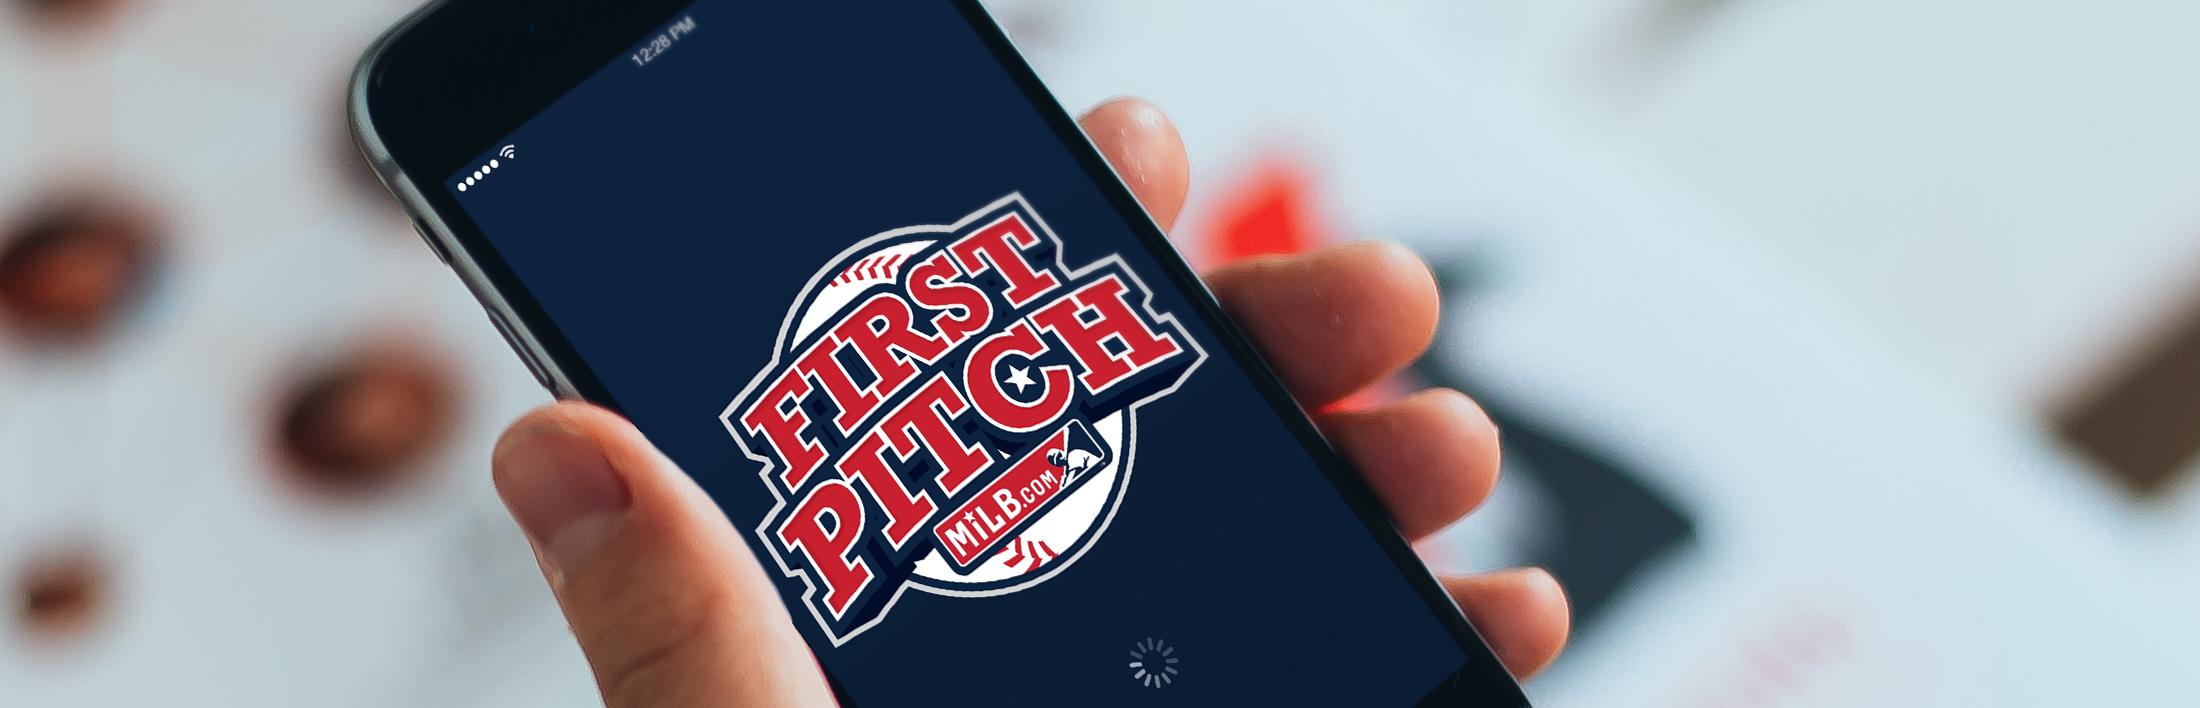 UXUI_First_Pitch_01.jpg